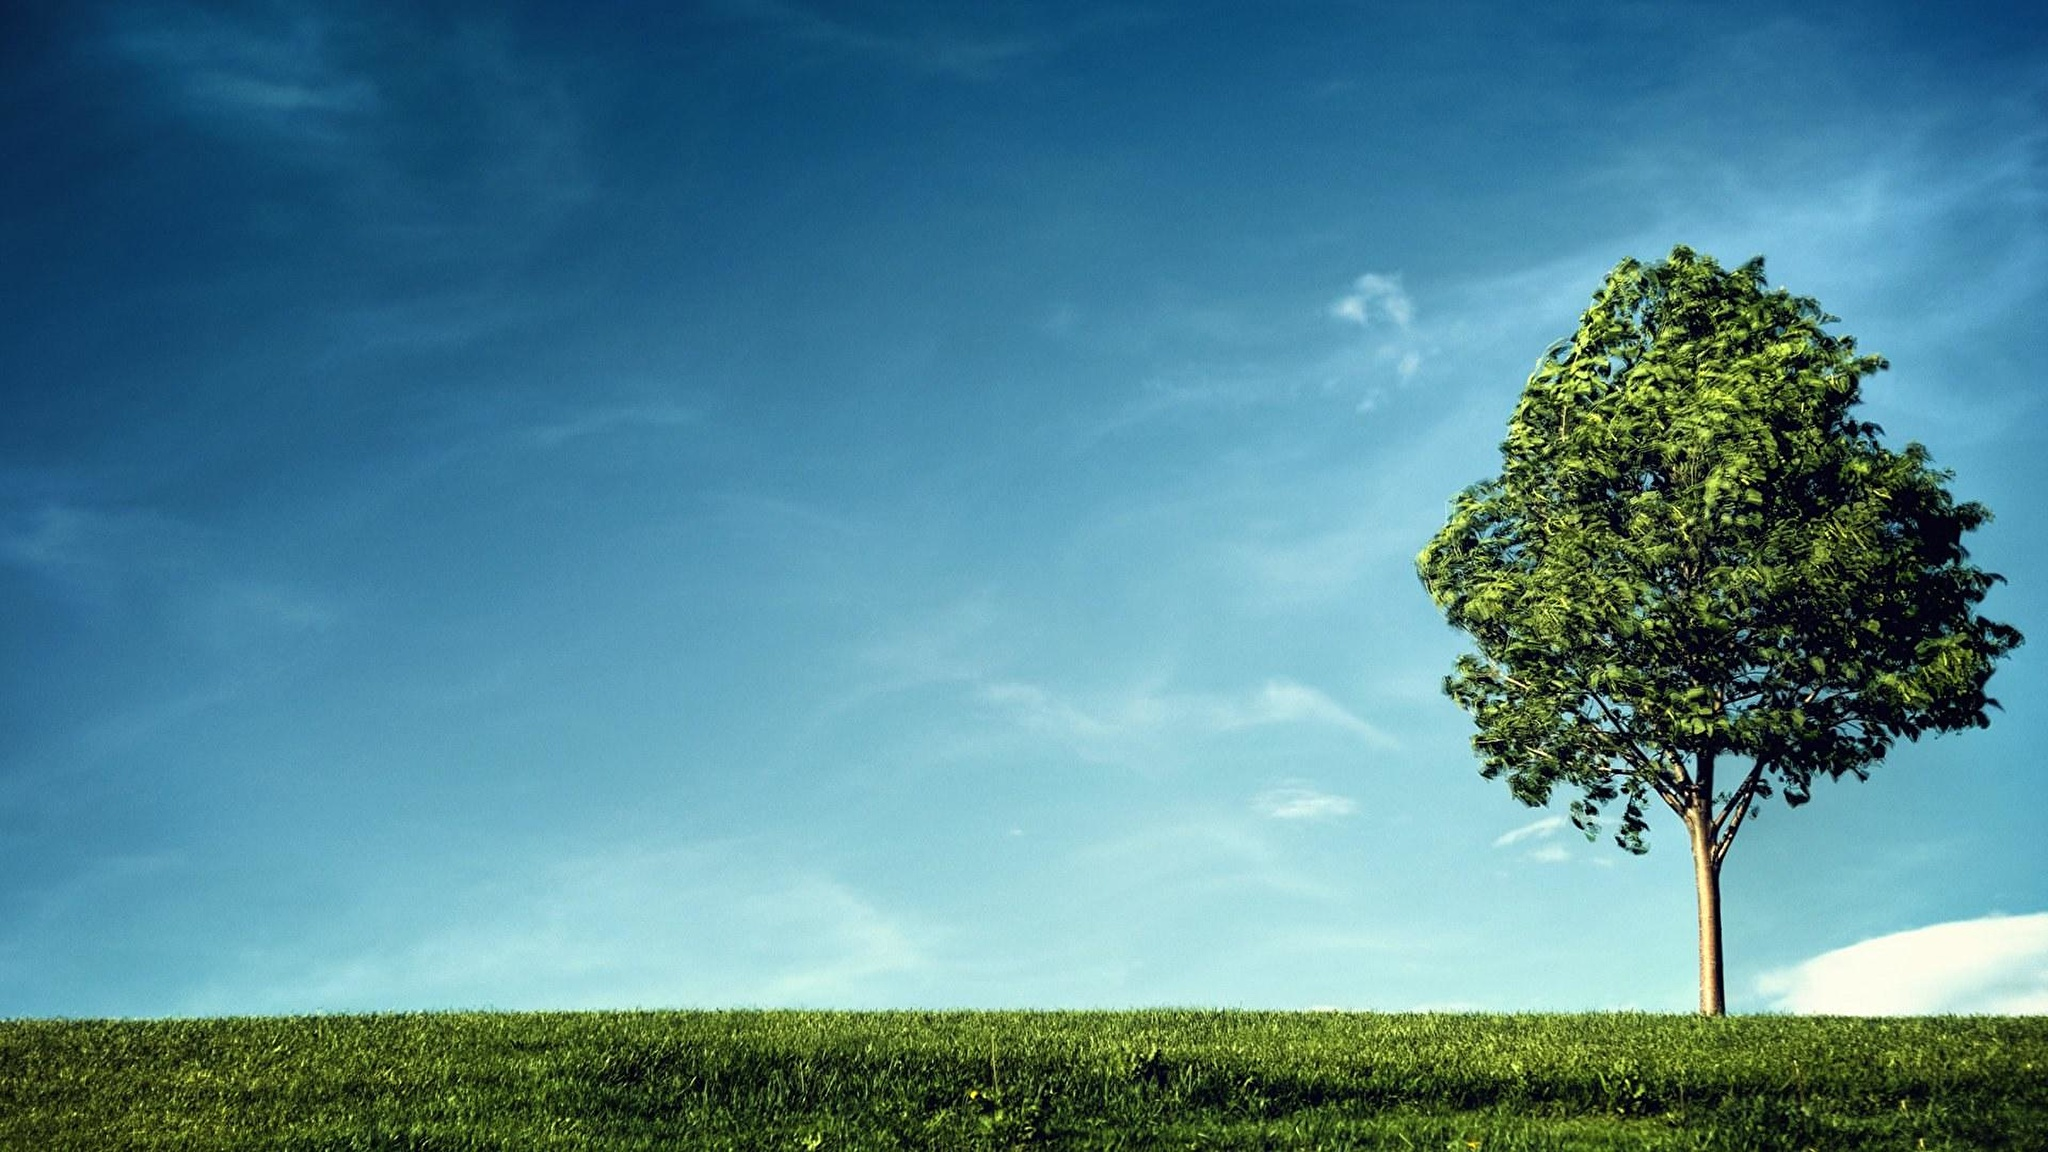 природа дерево трава пейзаж подборки